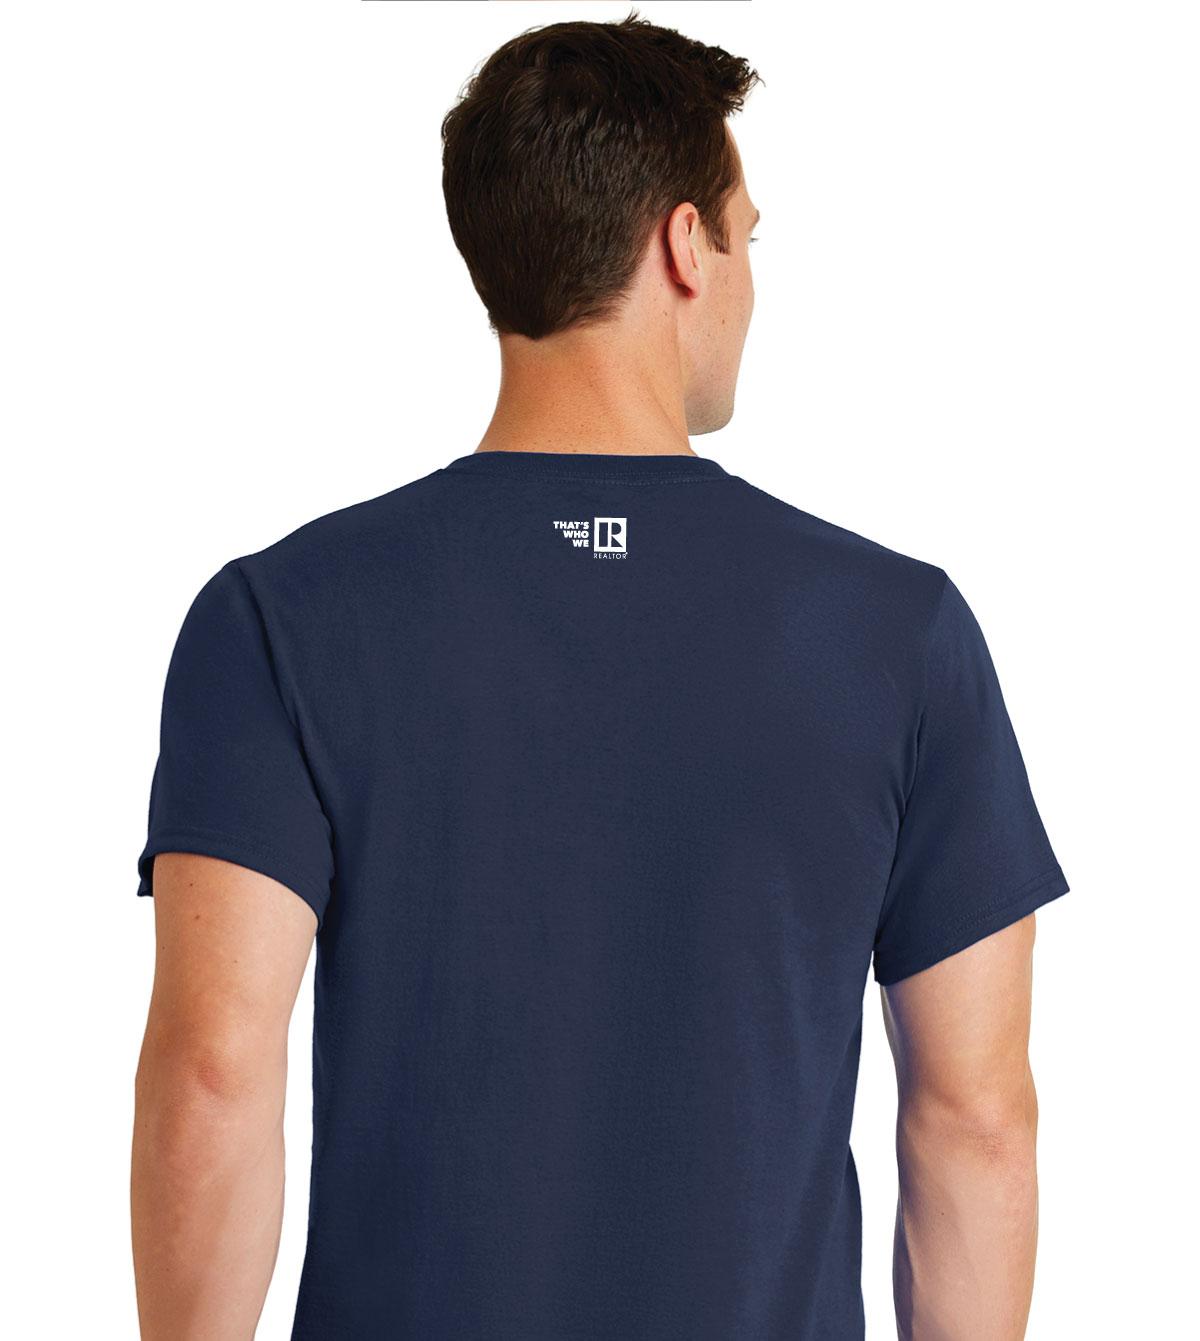 REALTOR® Pride Tee Shirt - RCG1141